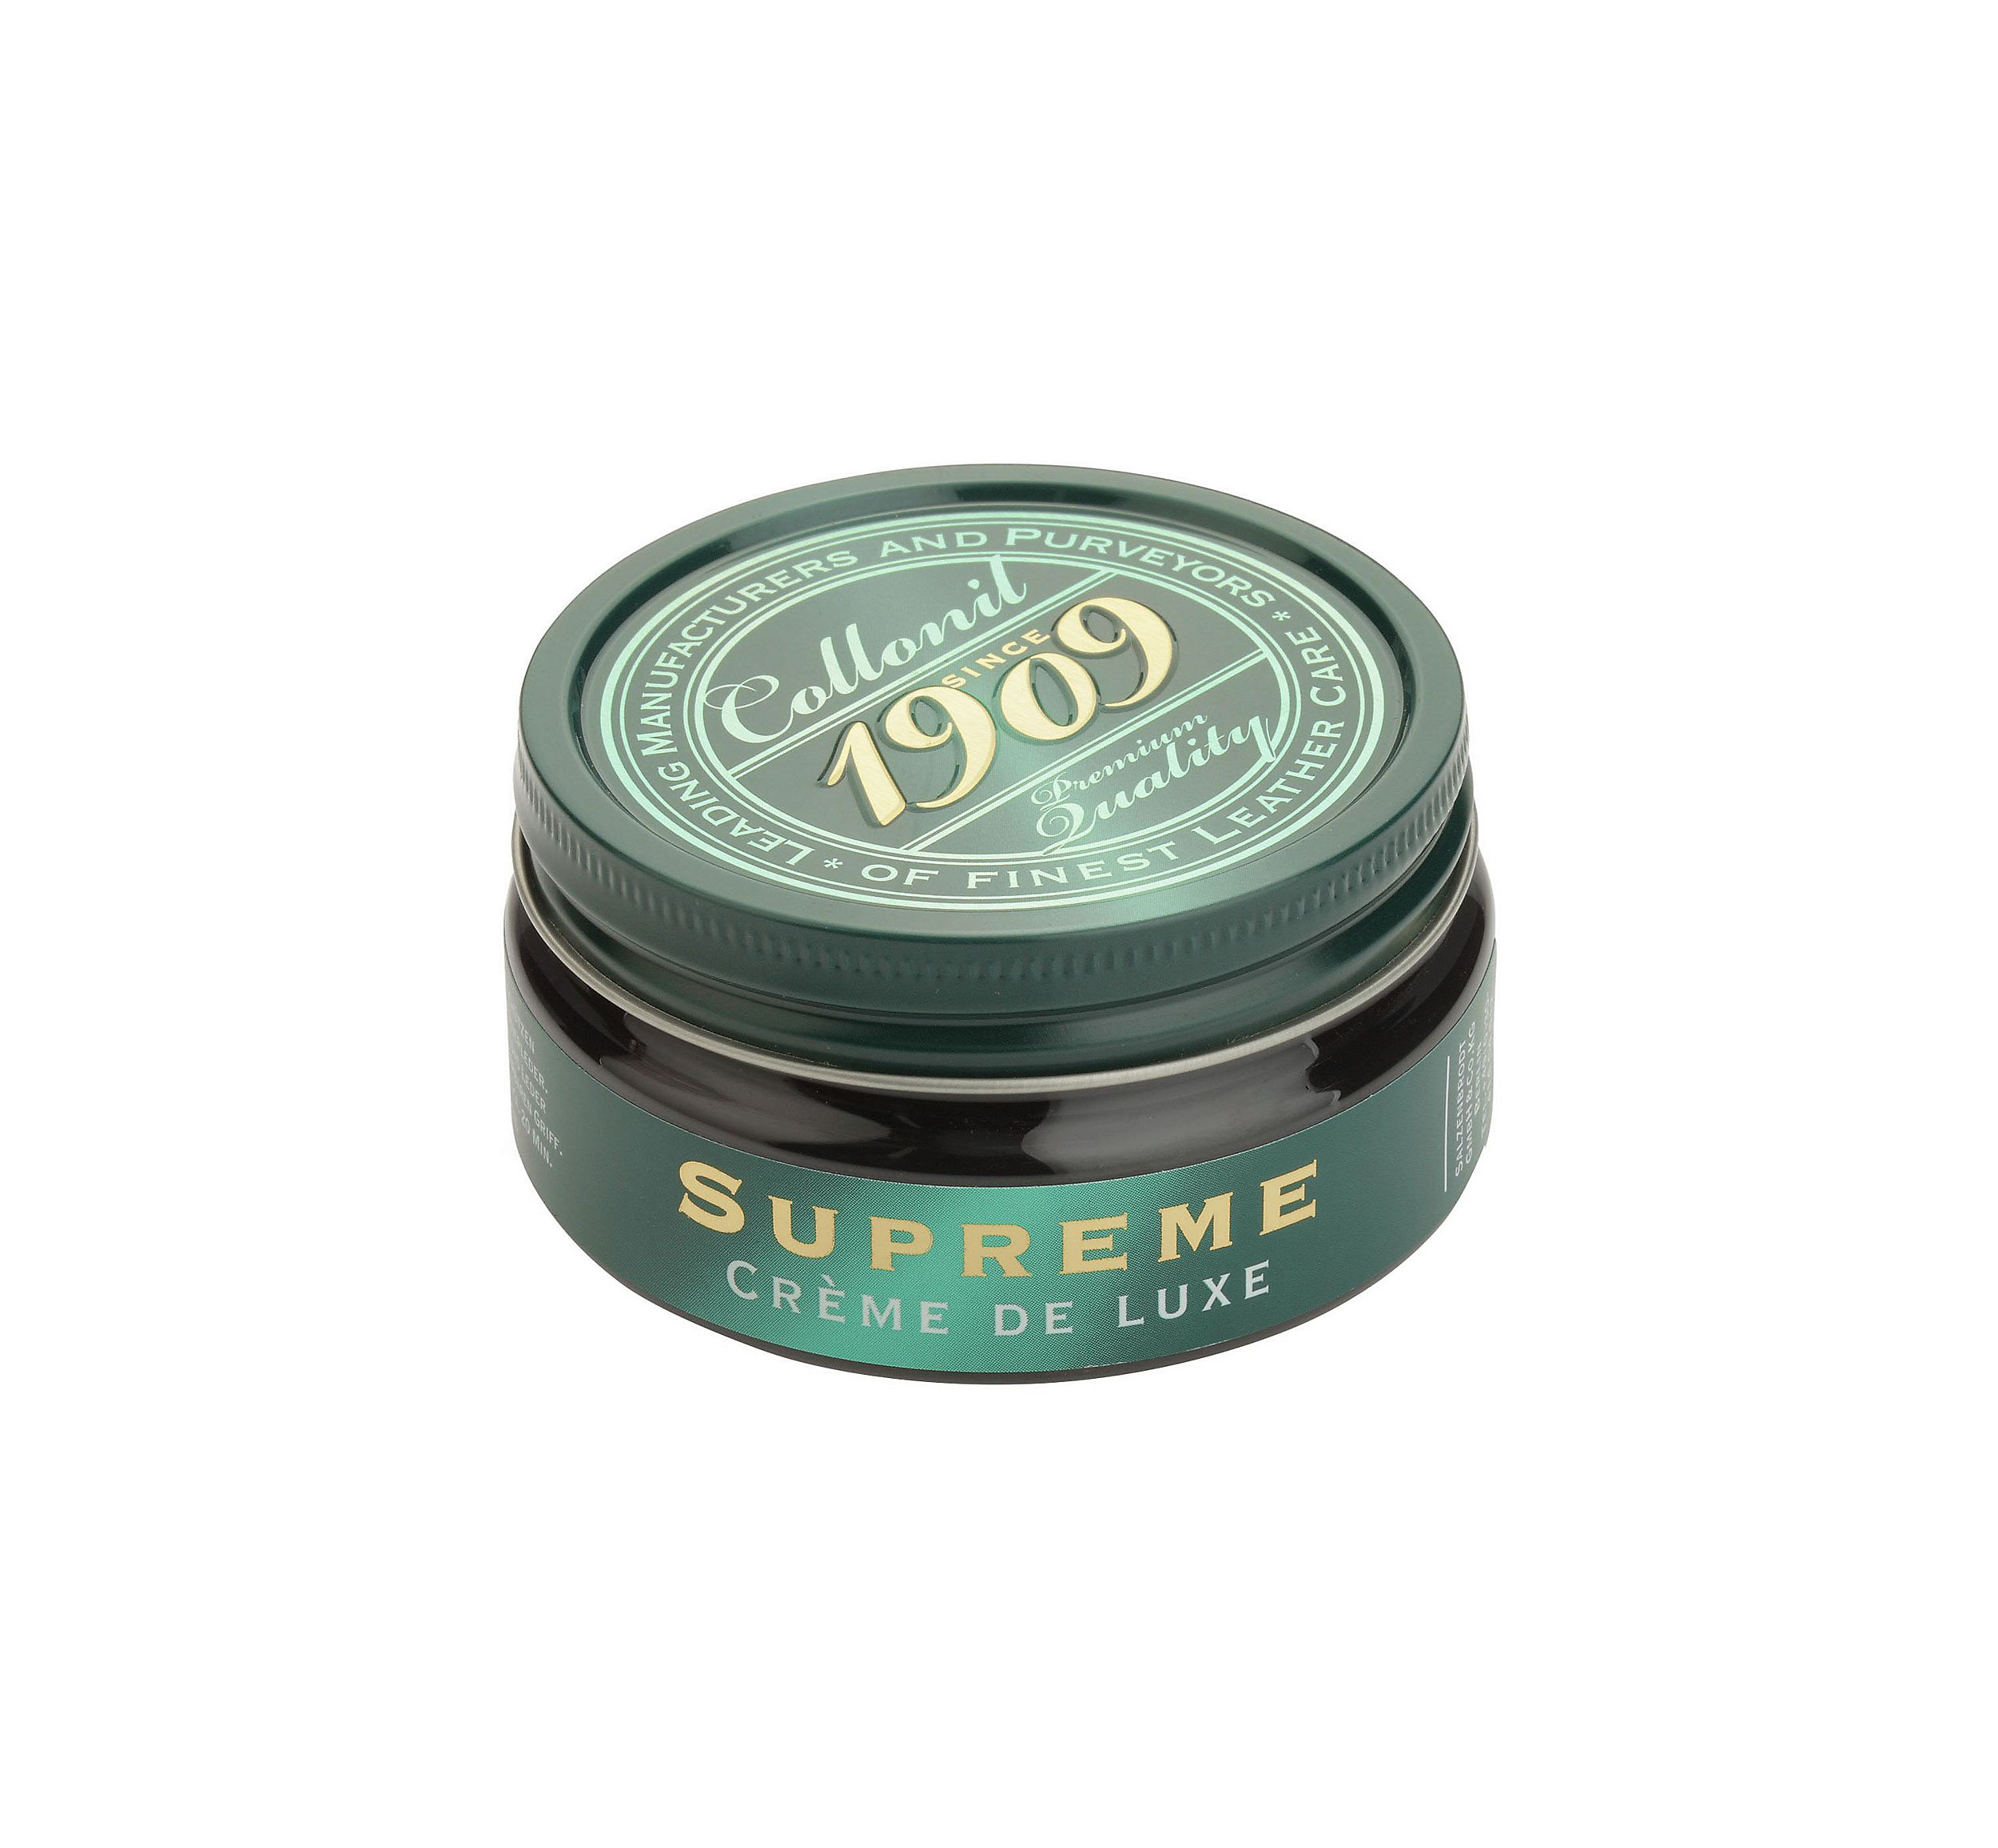 Collonil Supreme Crème de luxe schwarz